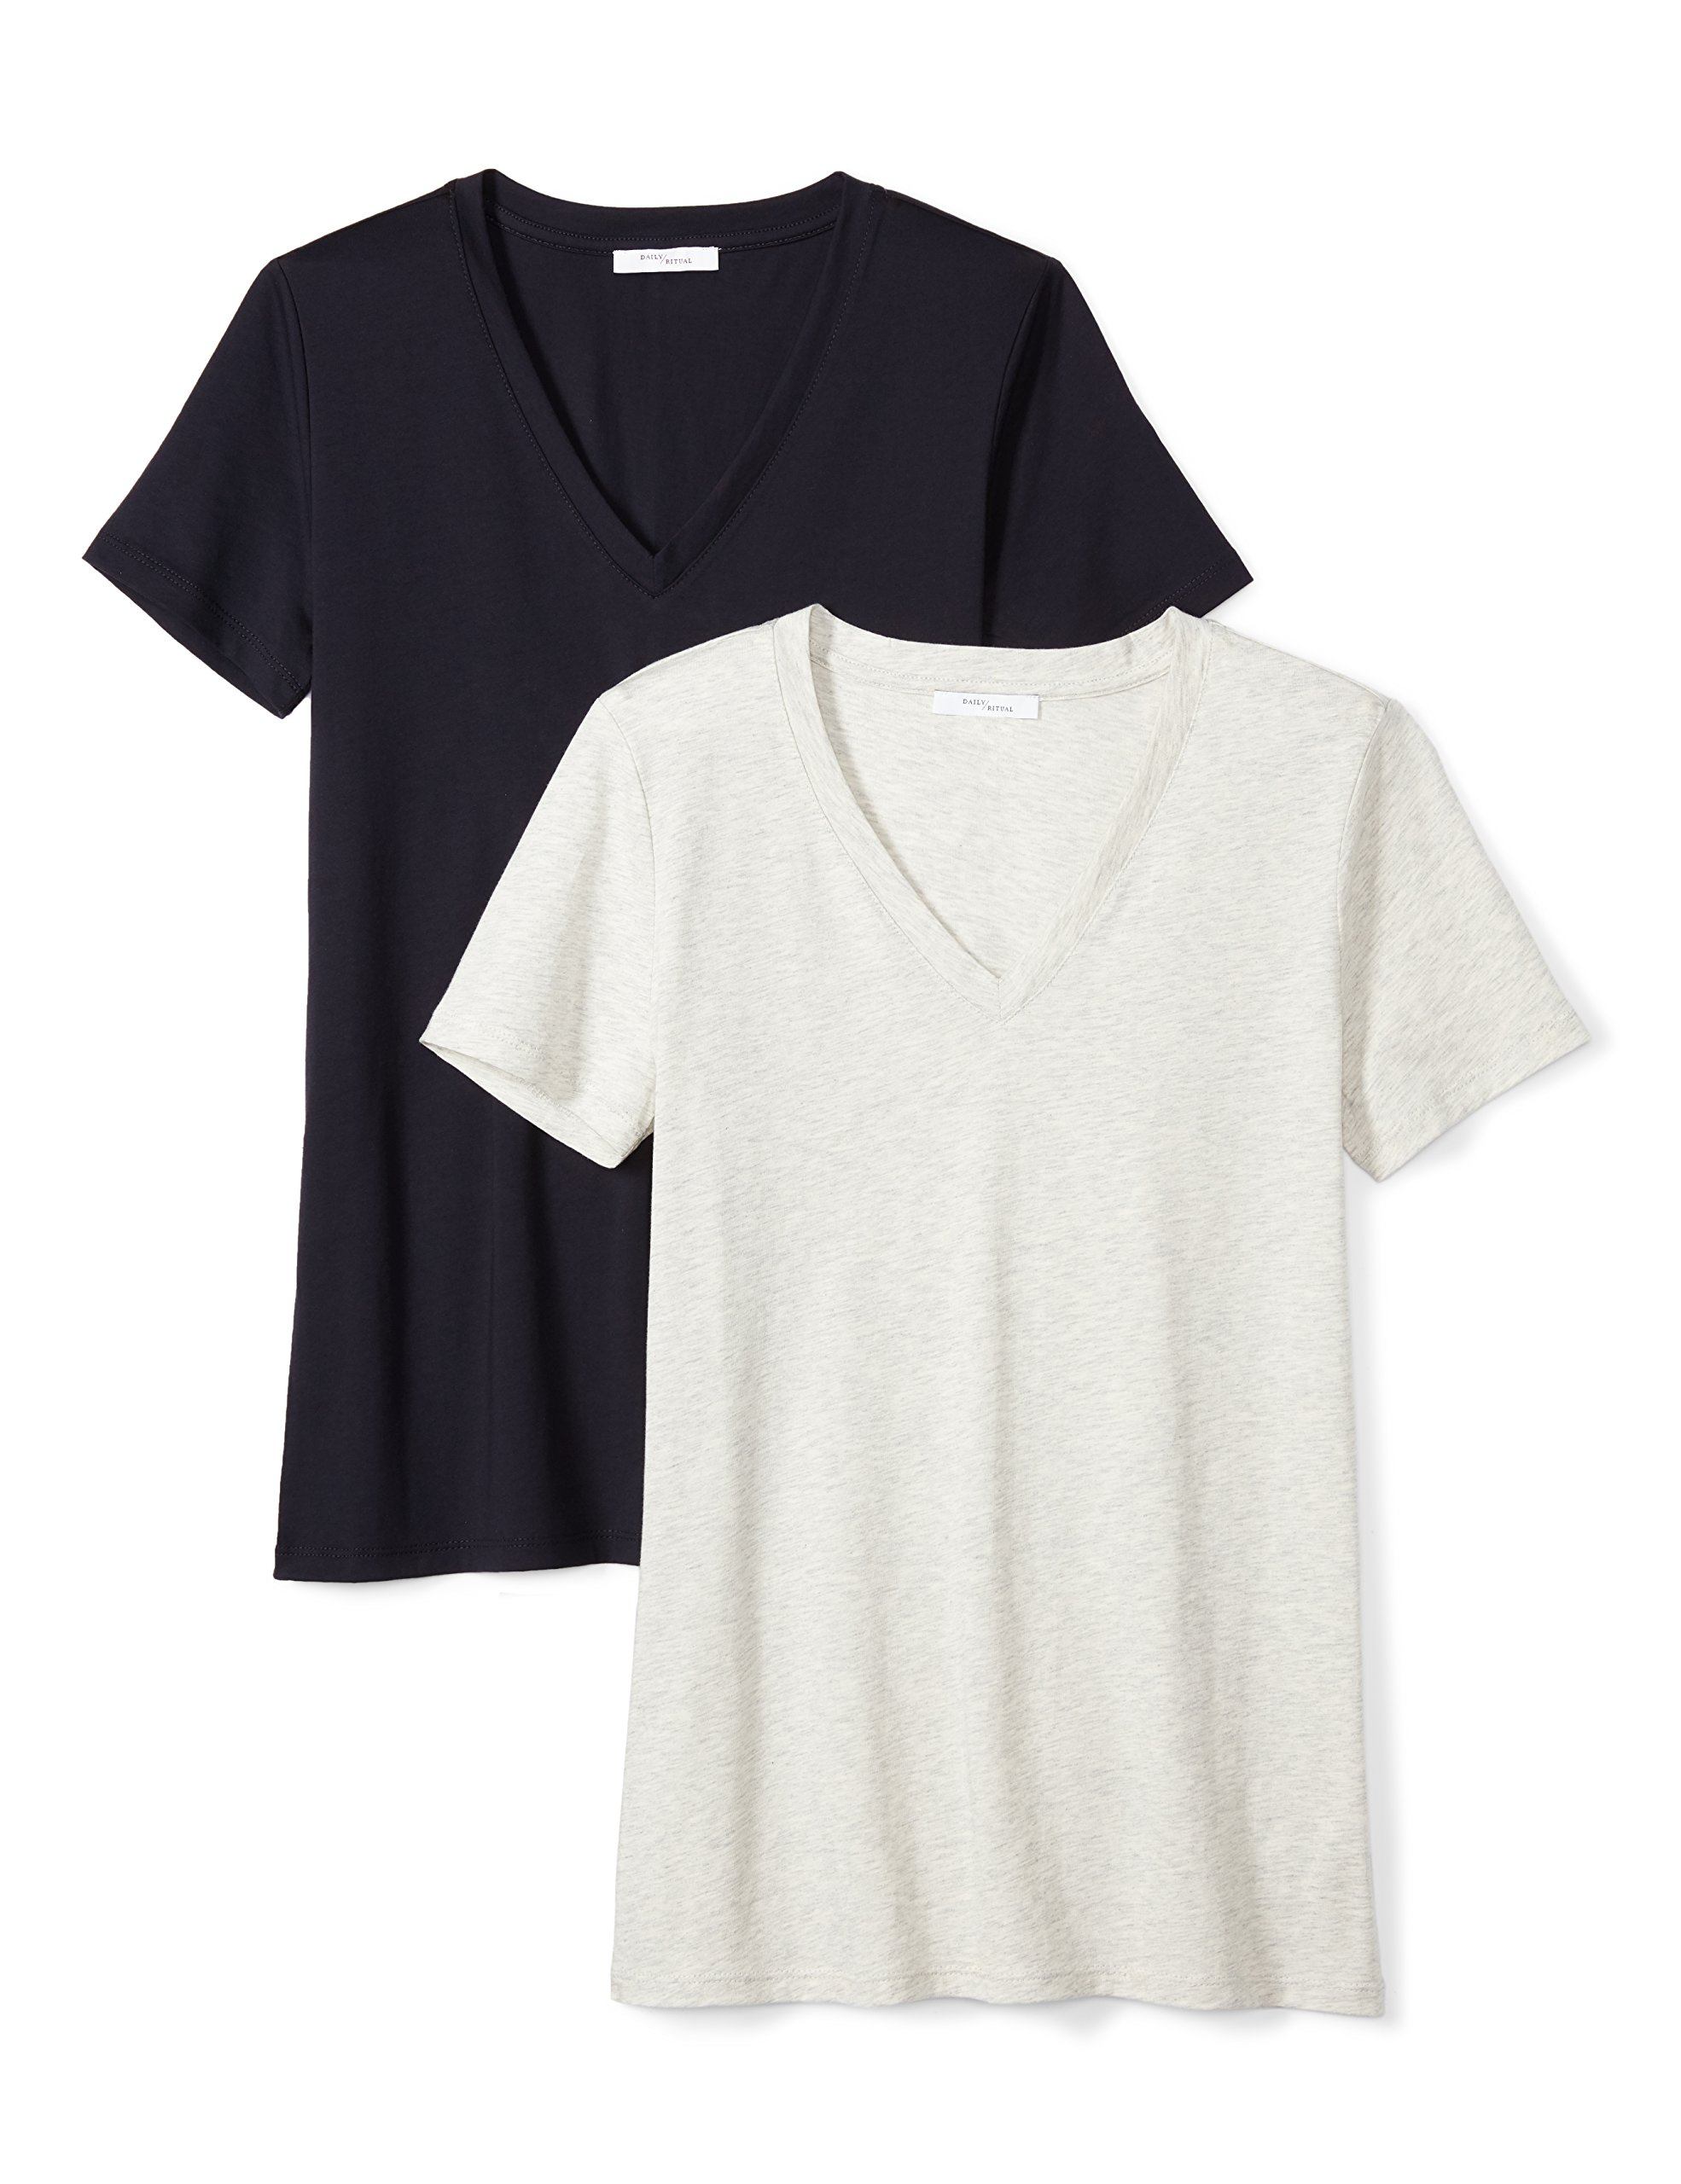 Daily Ritual Women's Lightweight 100% Supima Cotton Short-Sleeve V-Neck T-Shirt, 2-Pack, XXL, Navy/Heather Grey